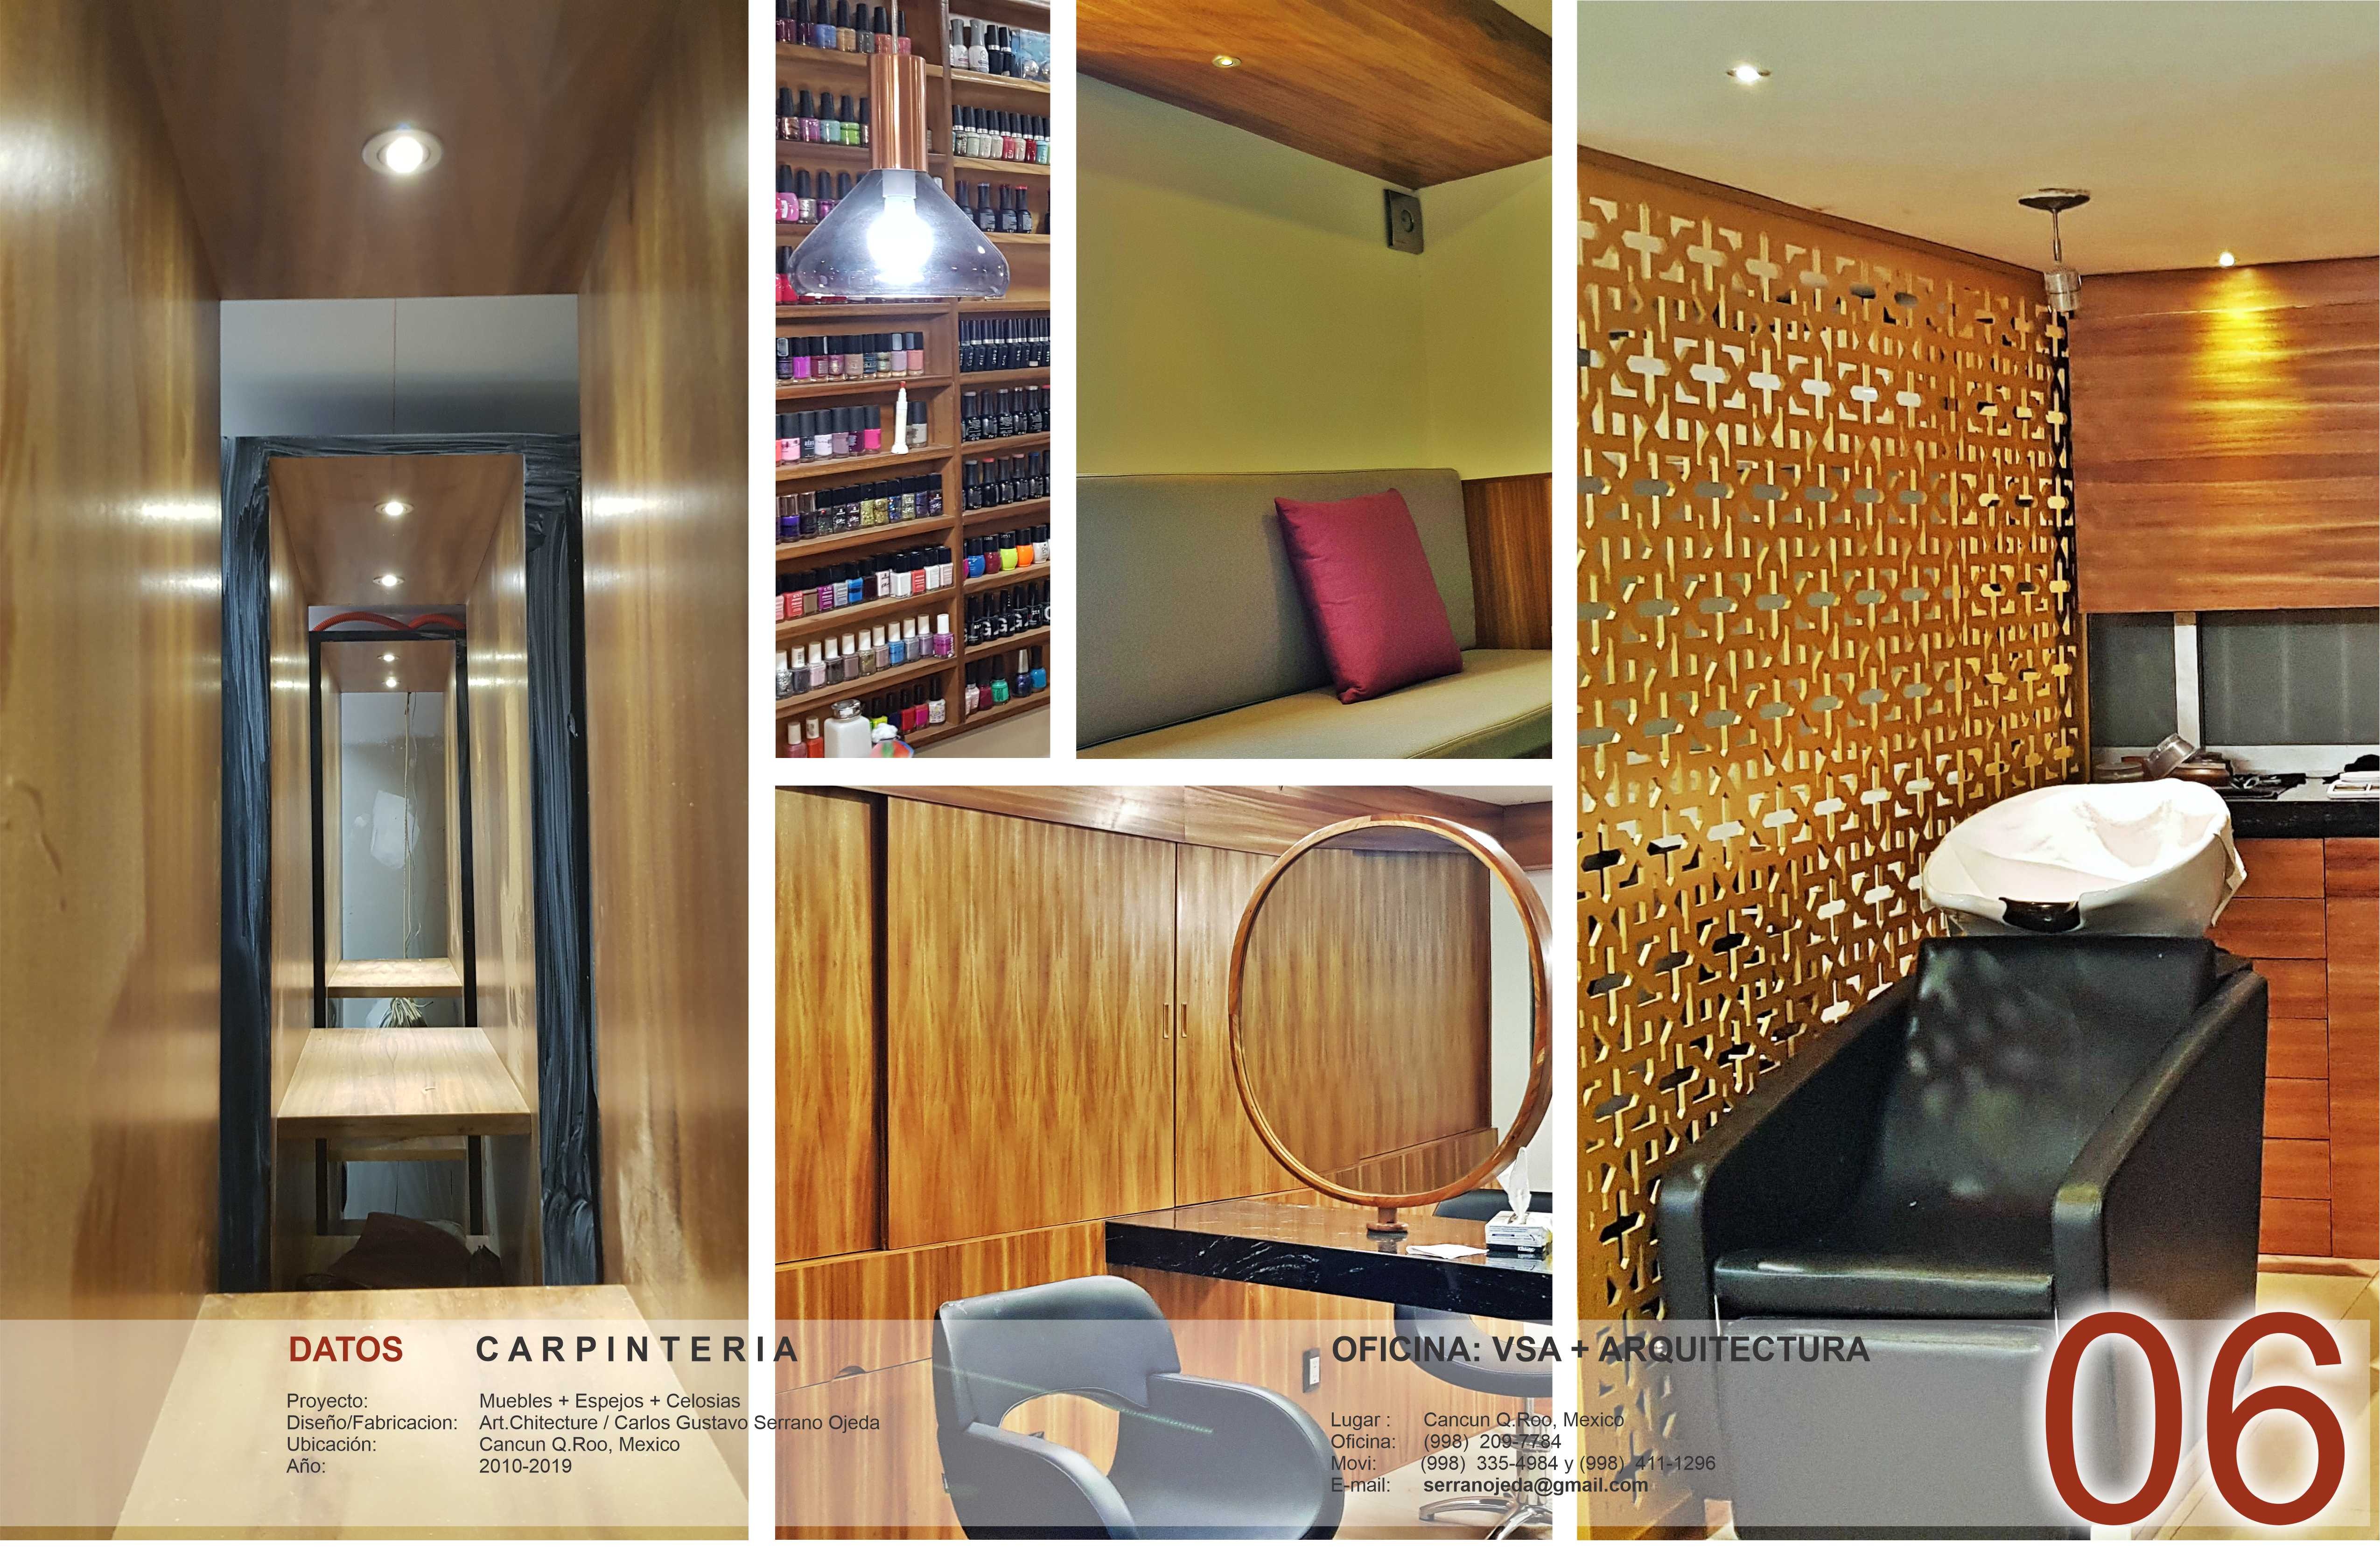 Formato Tabloide - Carpinteria 06.jpg